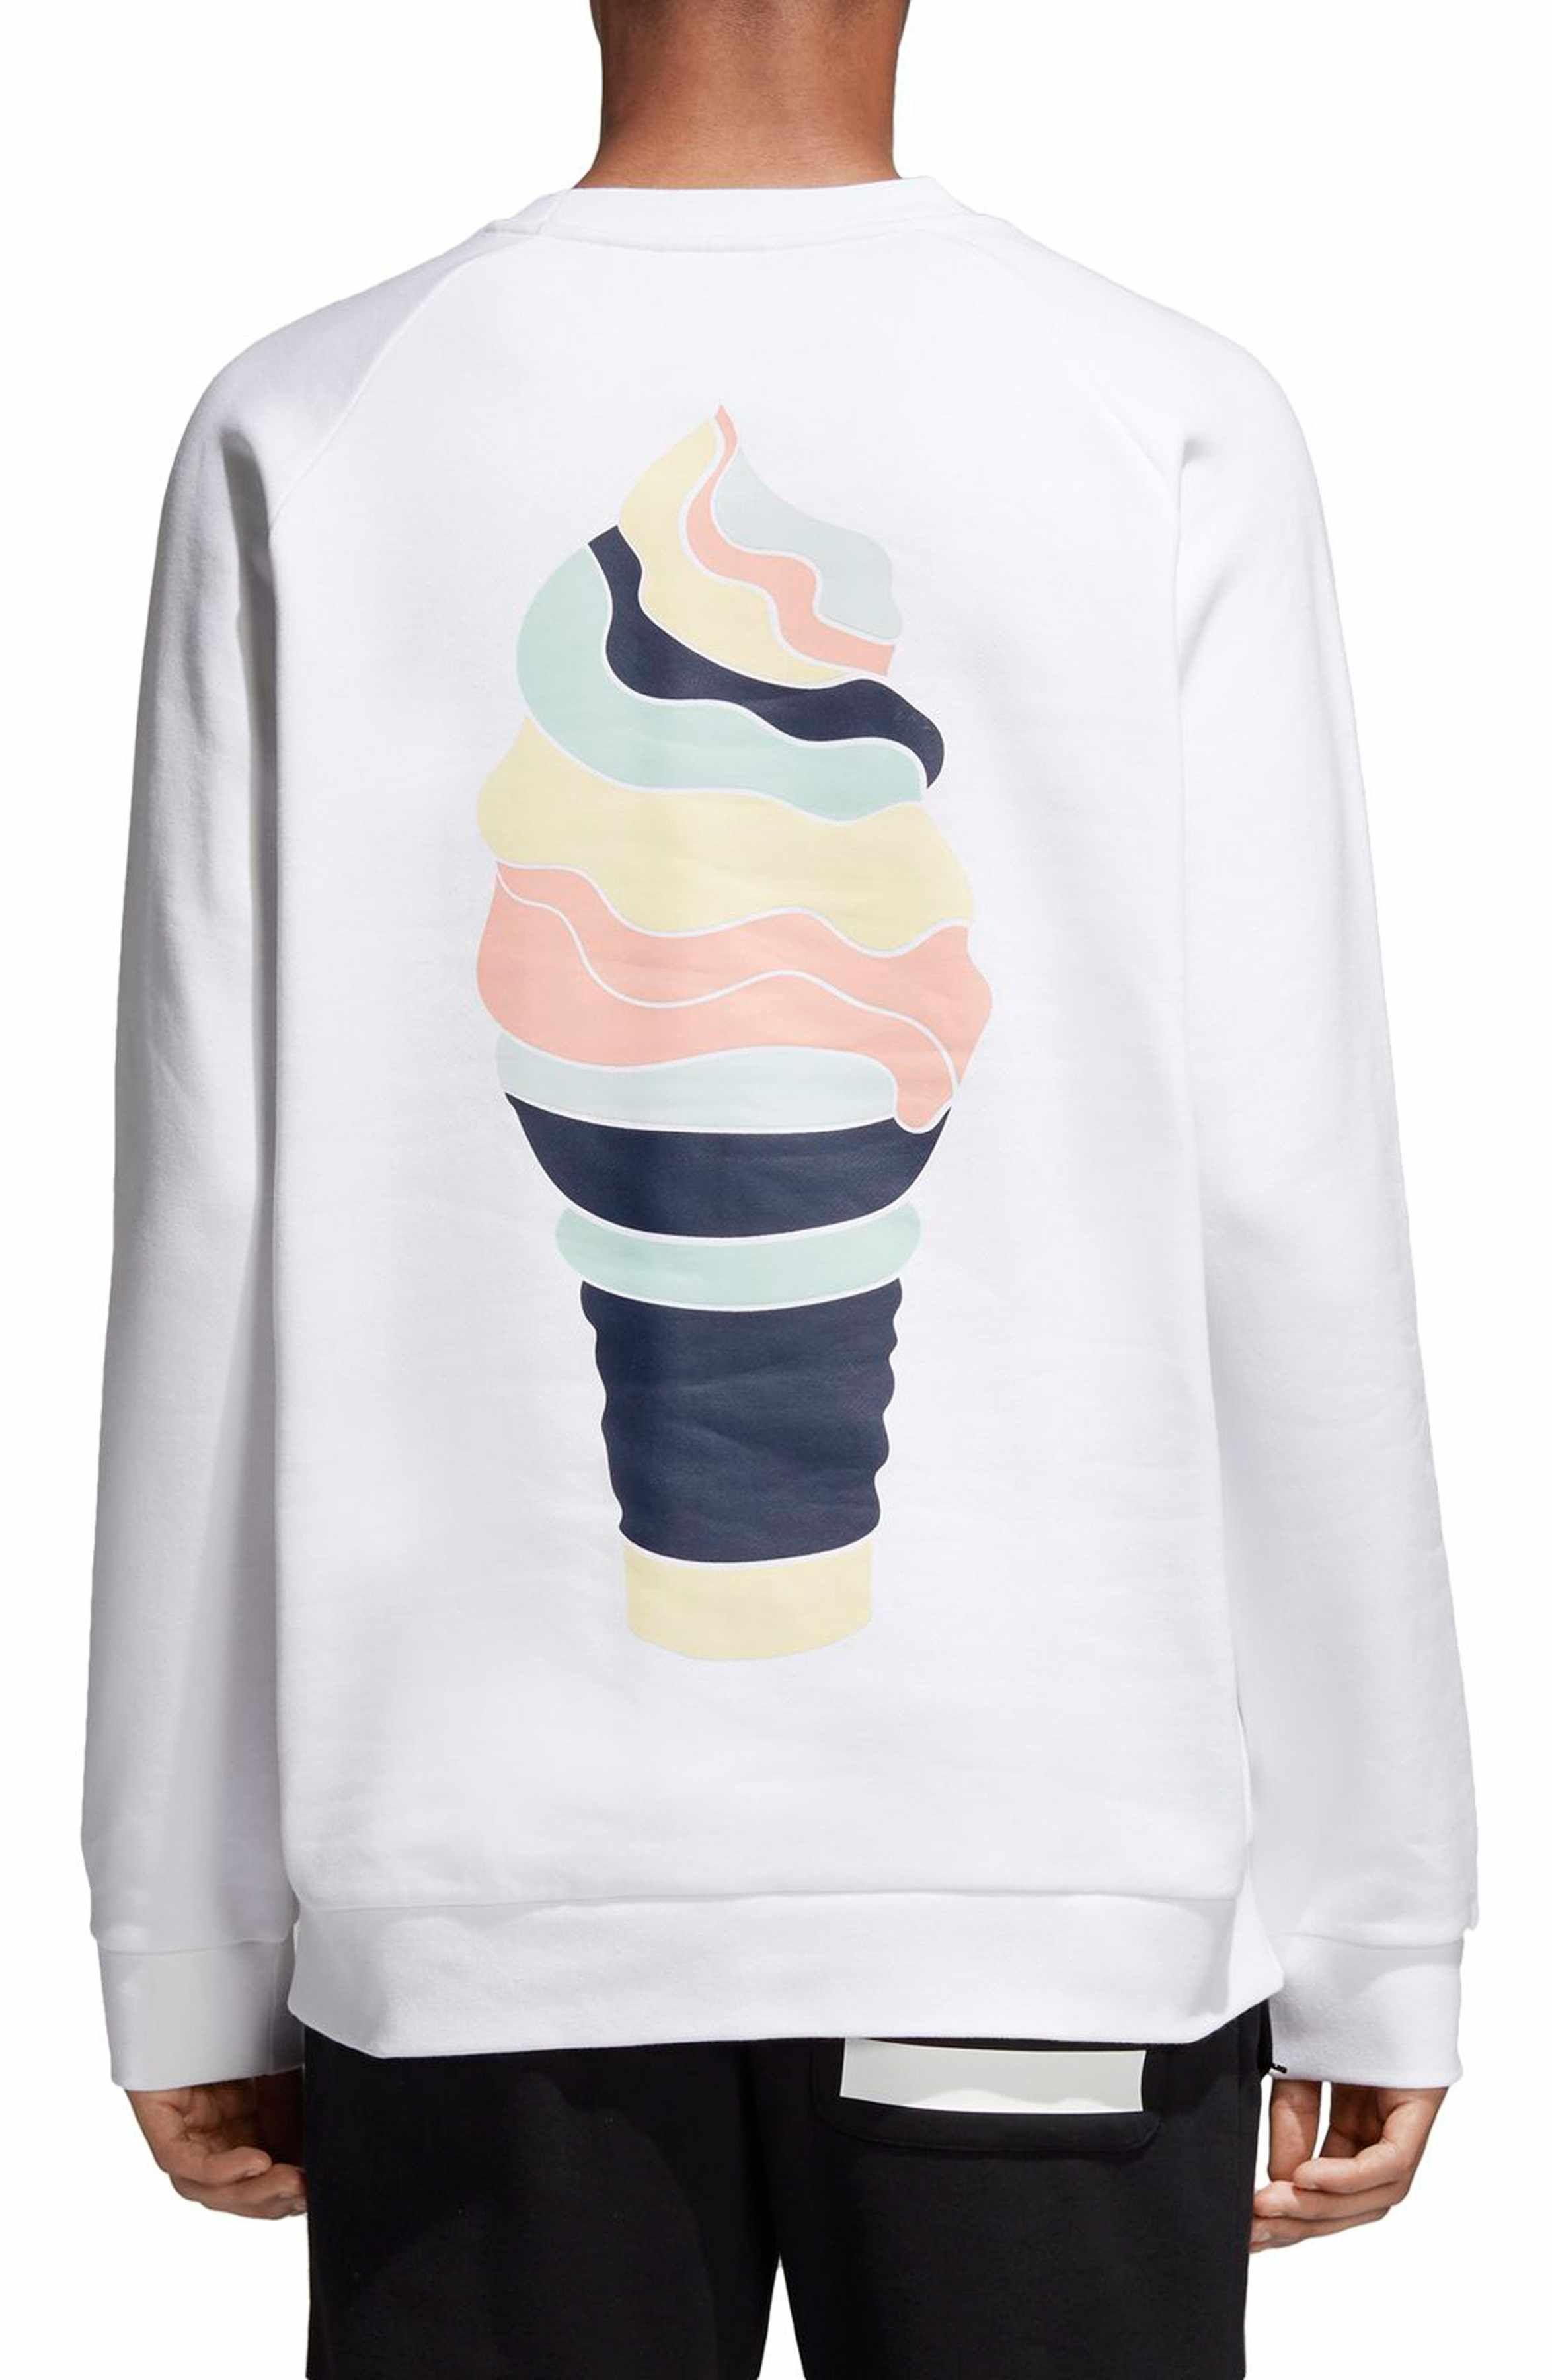 Adidas Originals Ice Cream Sweatshirt Nordstrom Sweatshirts Sweatshirt Fleece Adidas Originals [ 3600 x 2348 Pixel ]